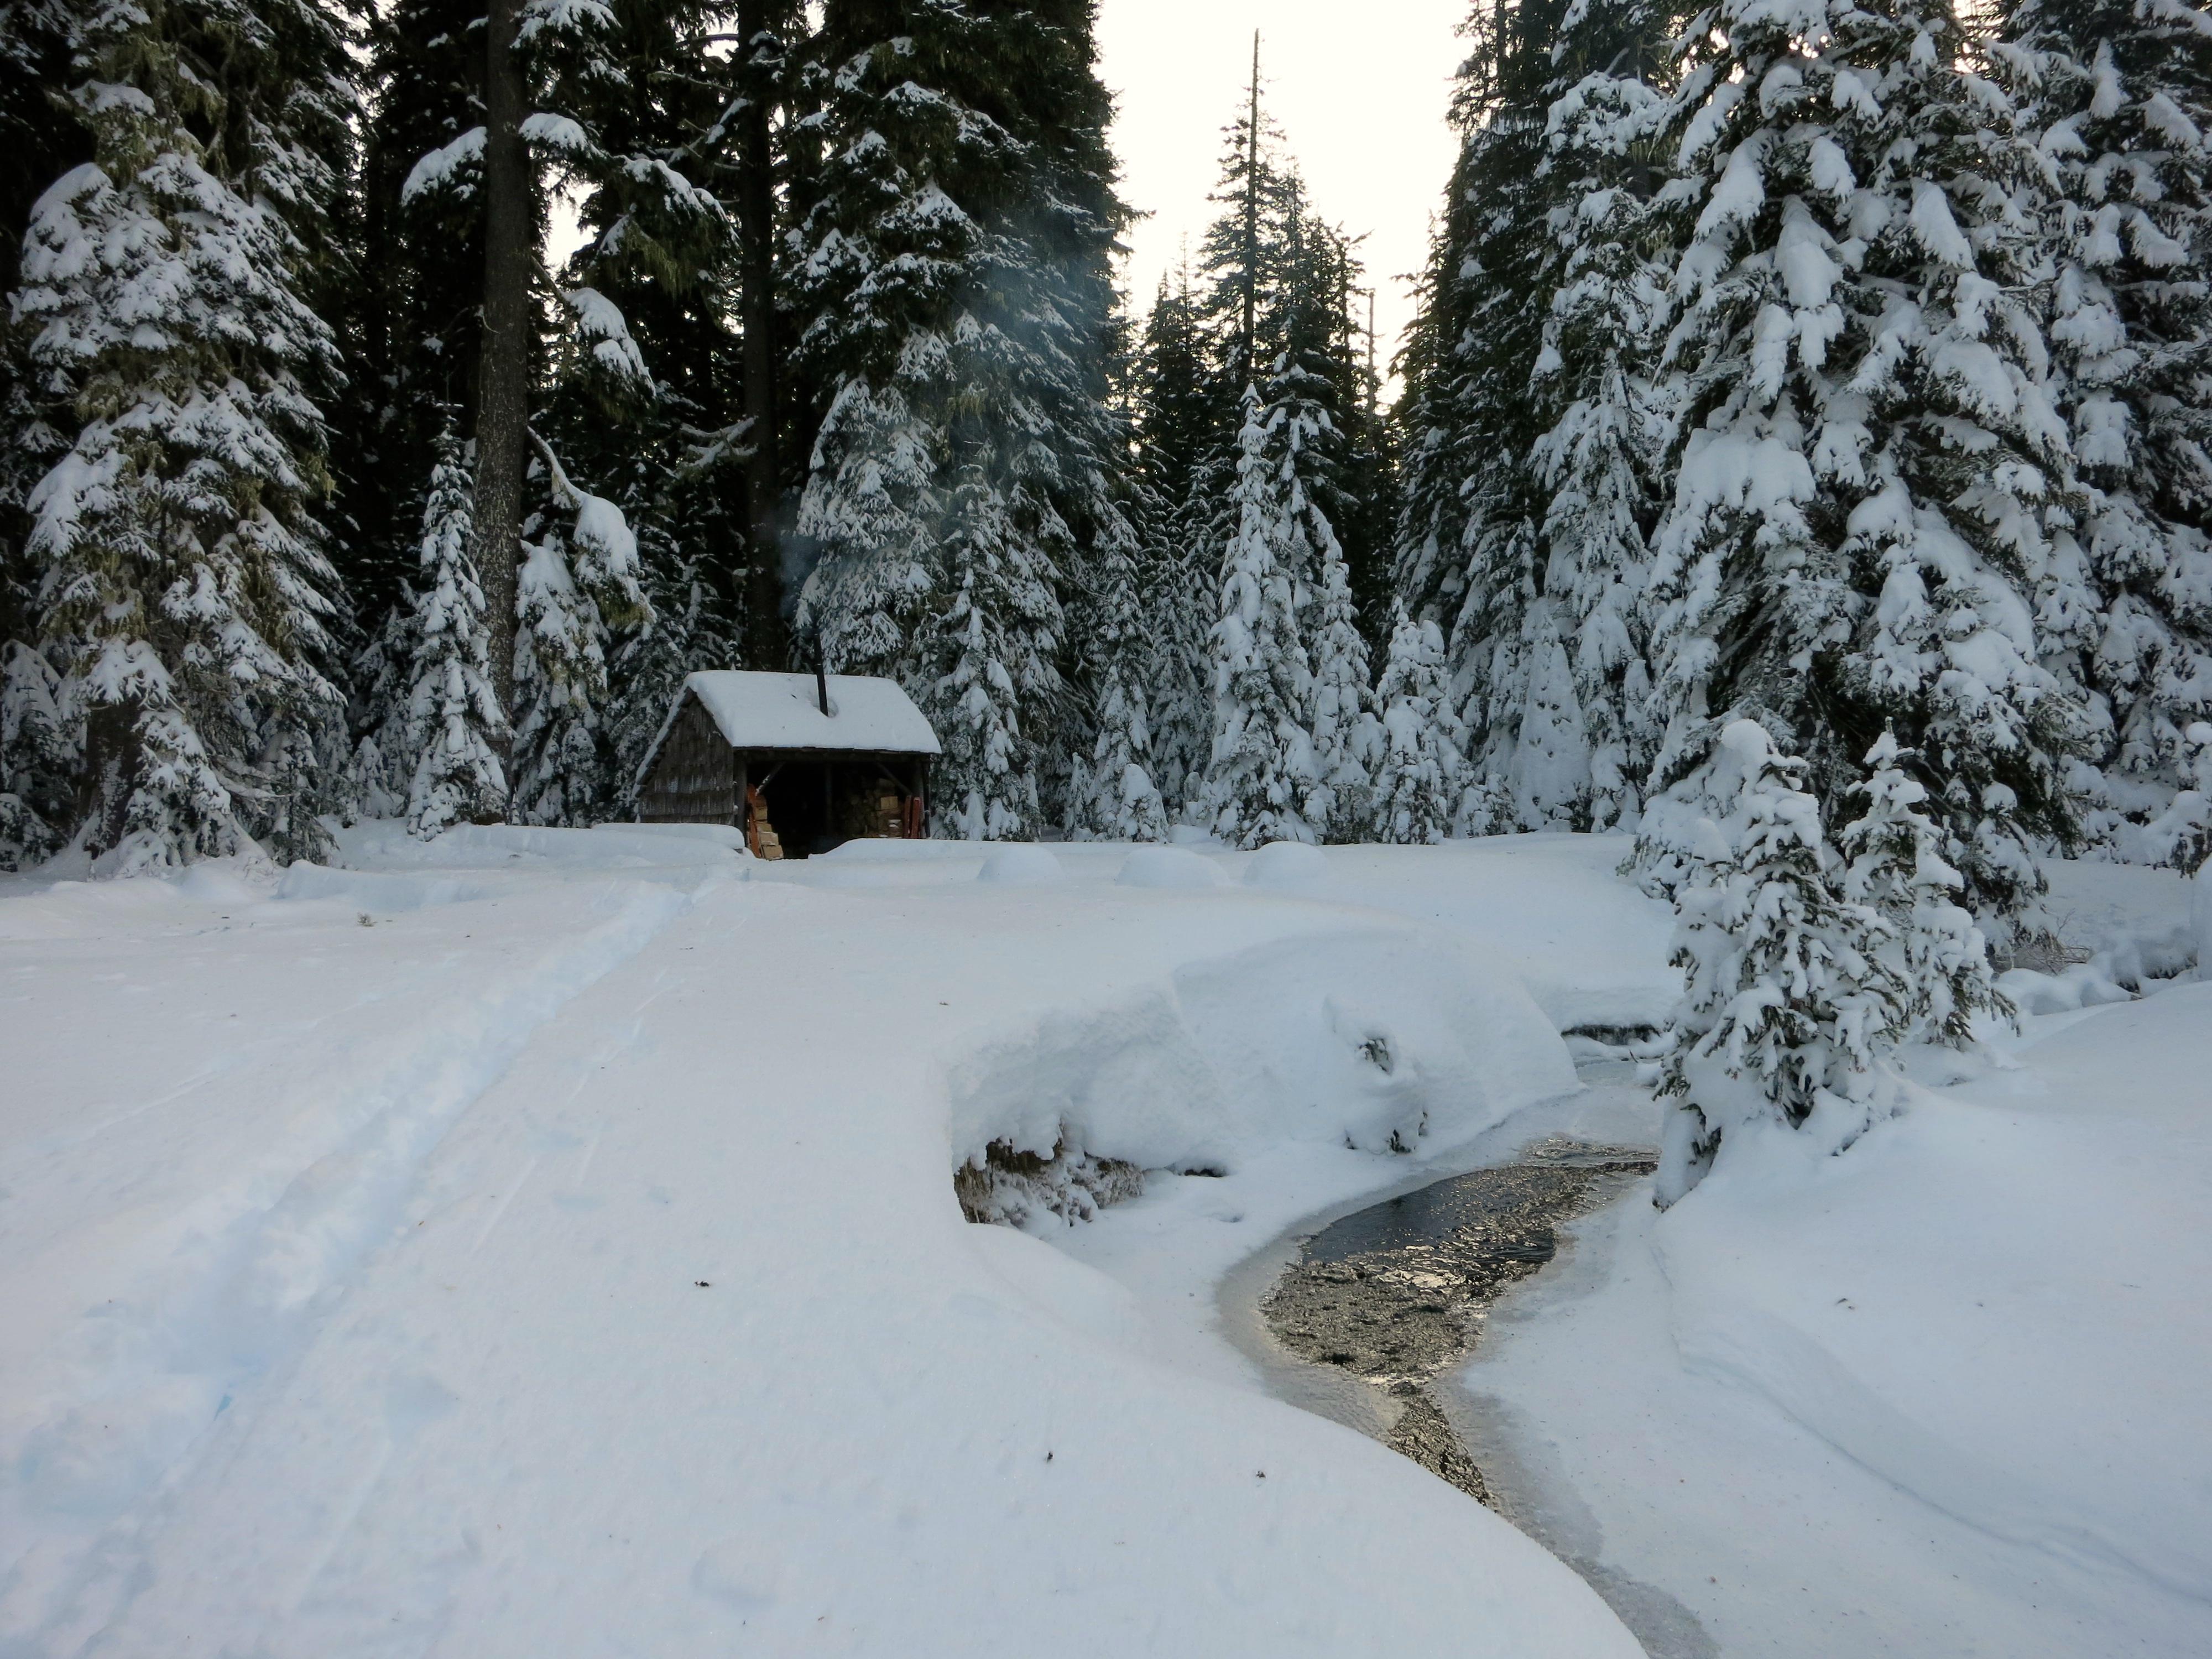 Snow and woodsmoke